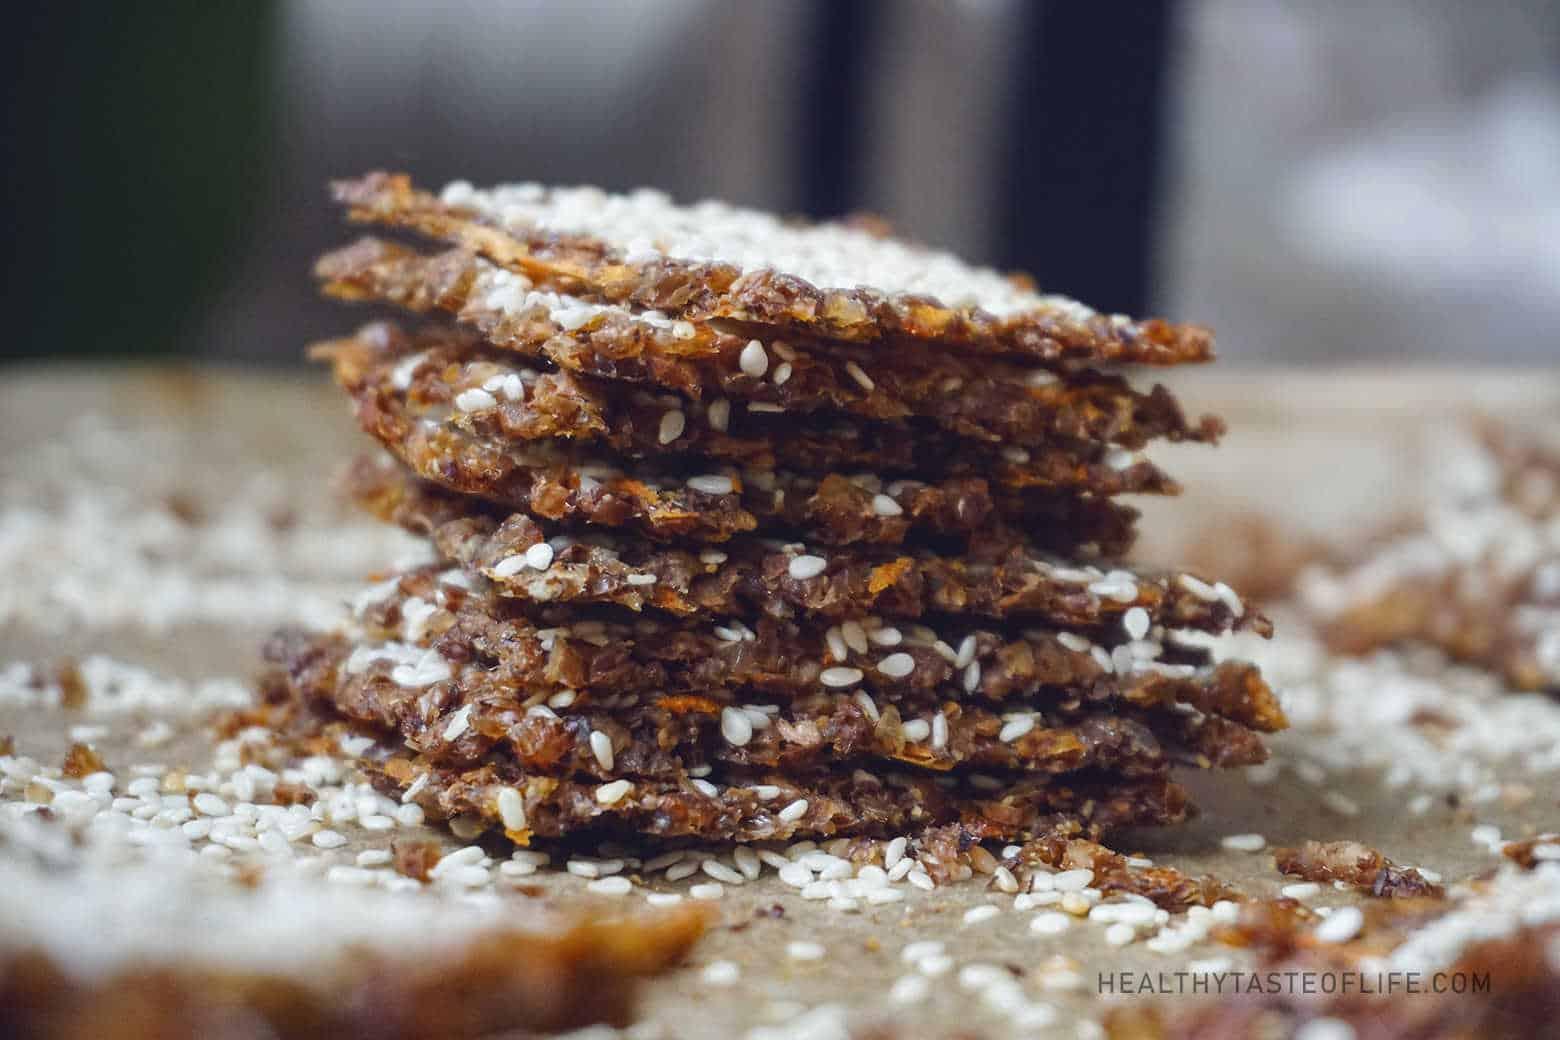 Buckwheat crackers / crisps with  seeds and sweet potatoes  gluten free vegan snack